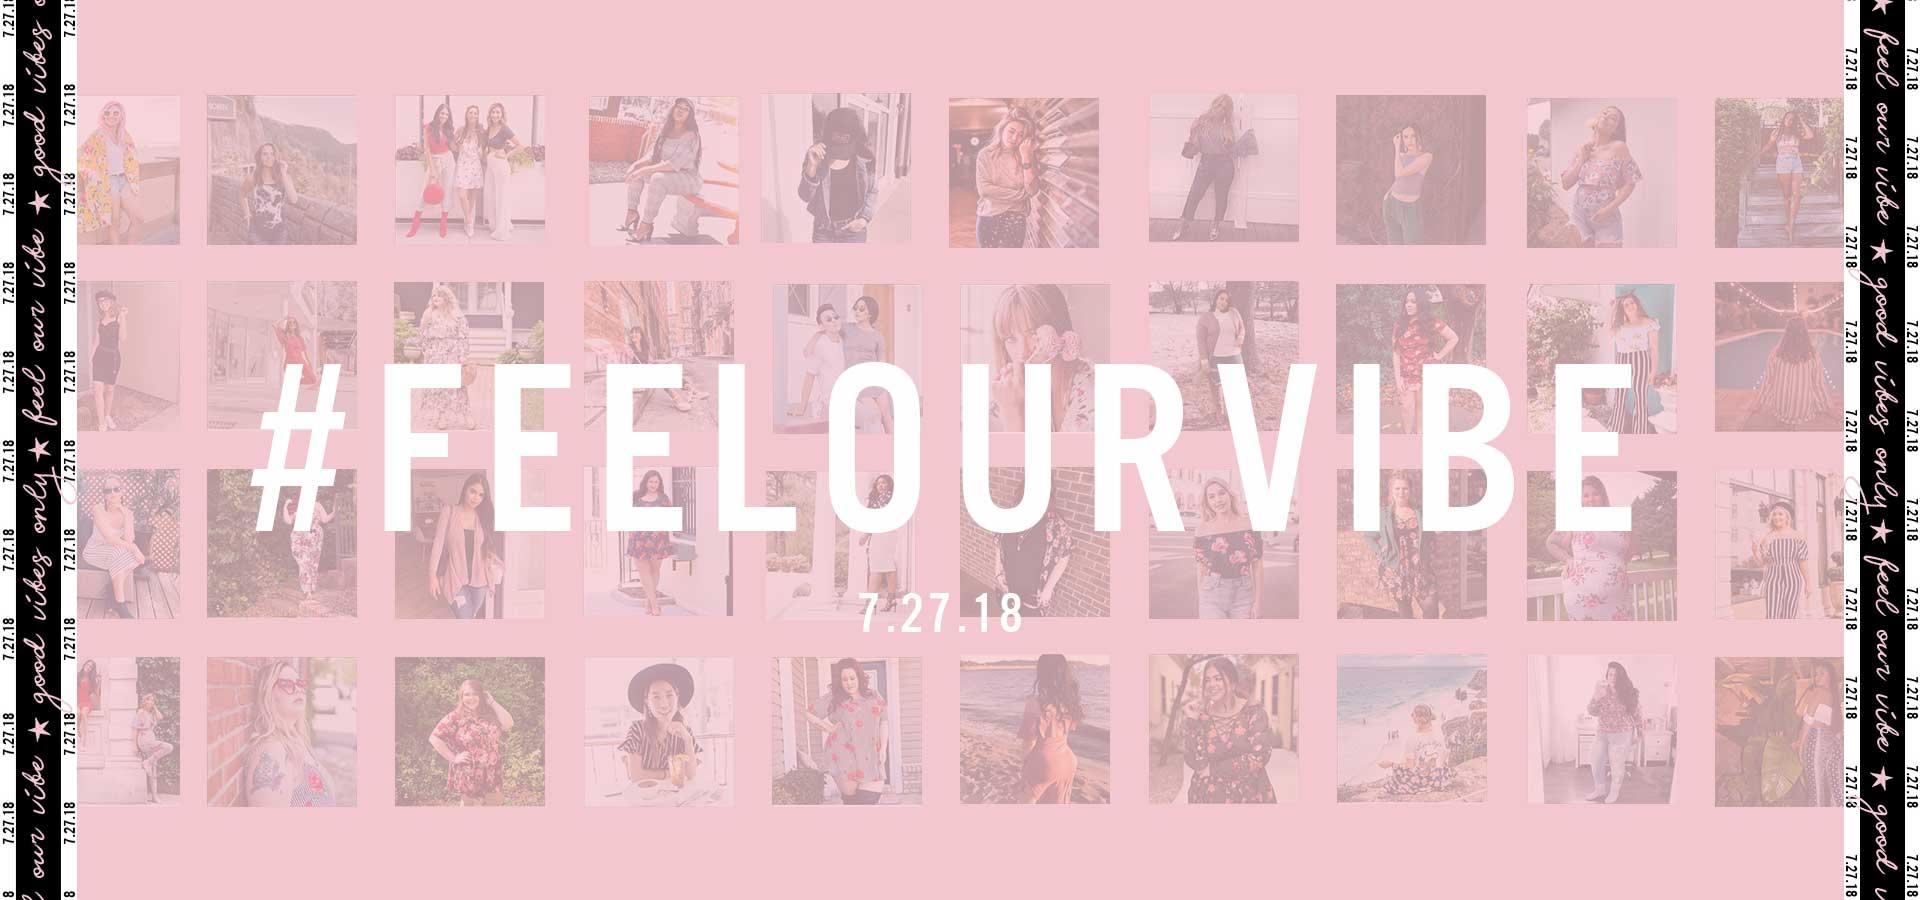 #FeelOurVIBE 2018